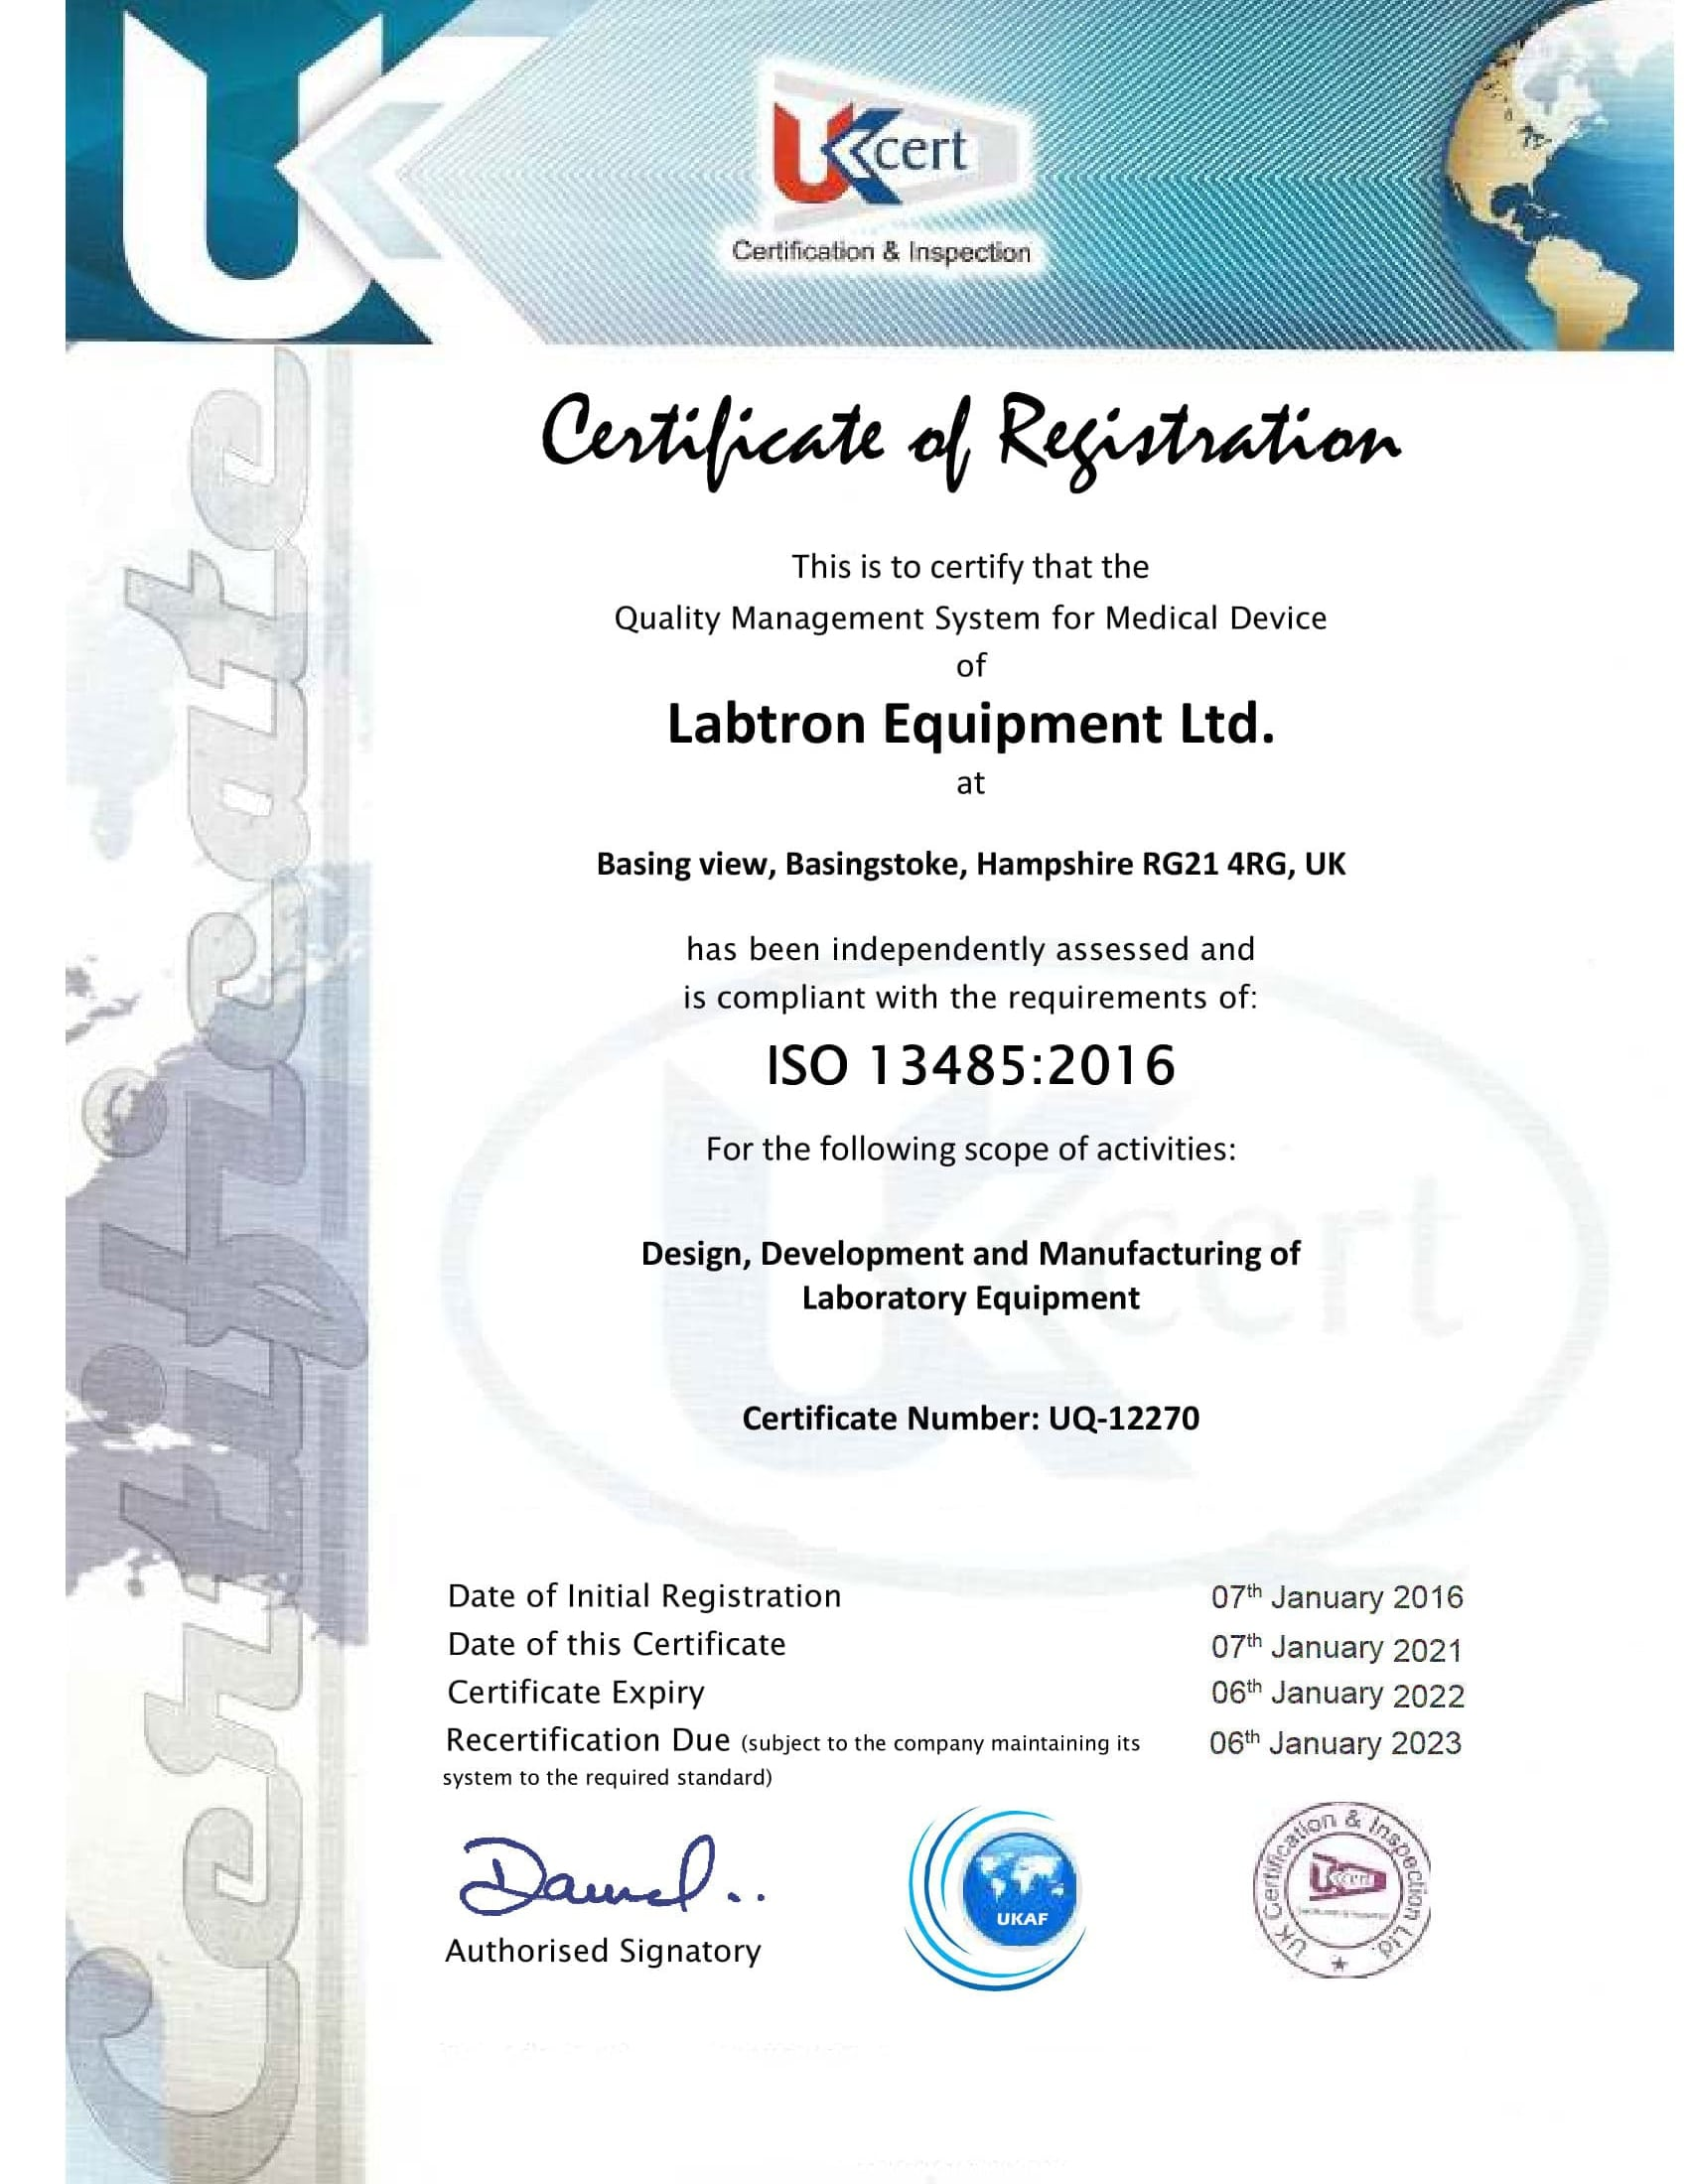 Labtron Equipment Ltd. GMP ISO 13485 UKCert : Labtron Certification